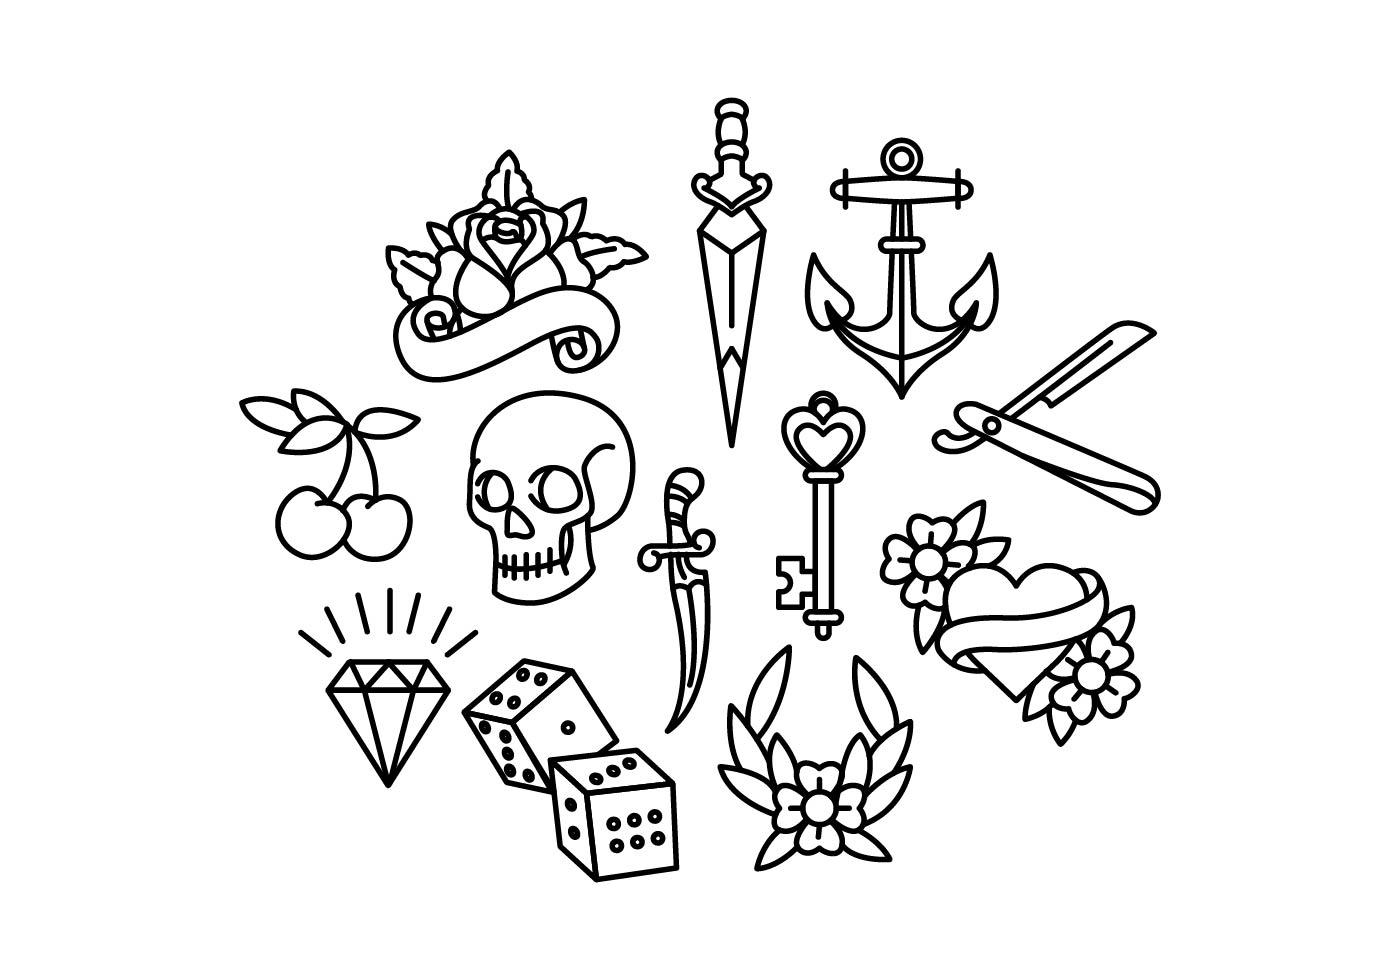 old school tattoo vectors download free vector art stock graphics images. Black Bedroom Furniture Sets. Home Design Ideas